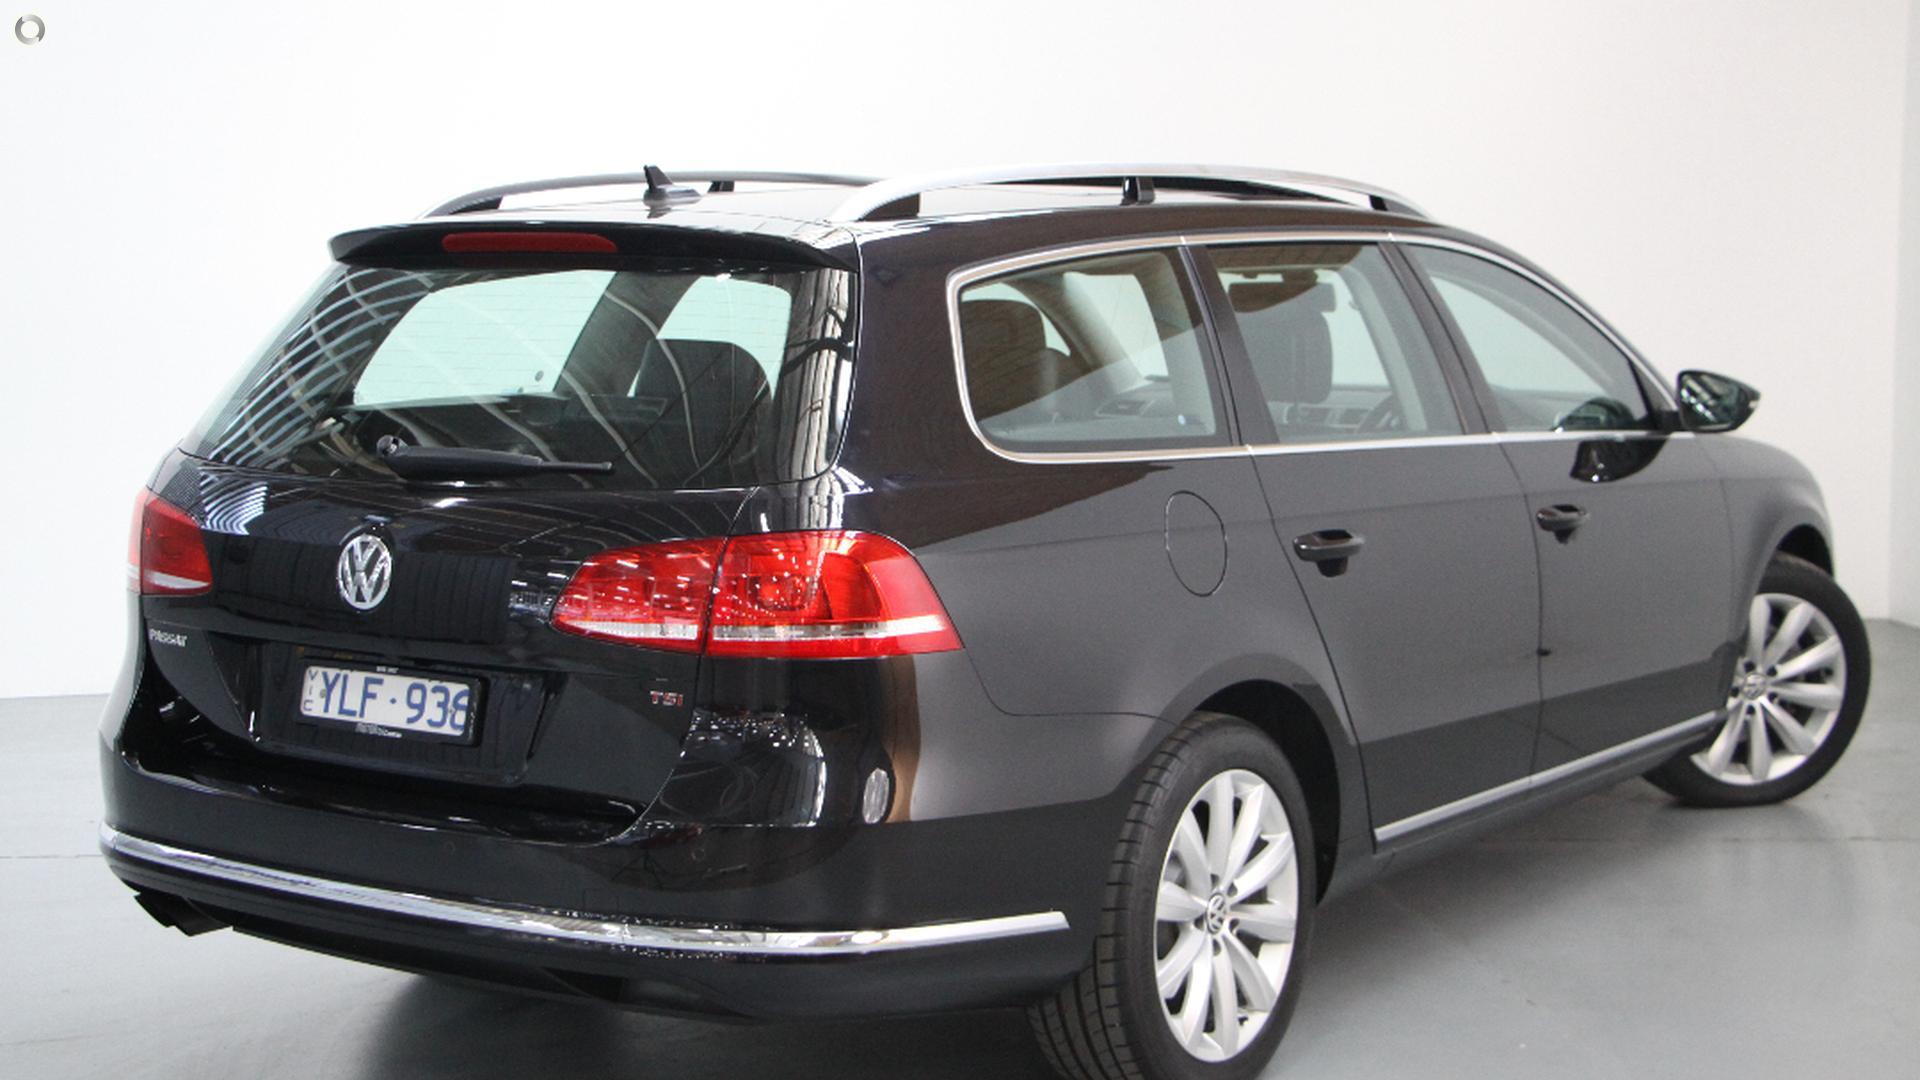 2010 Volkswagen Passat 118TSI Type 3C